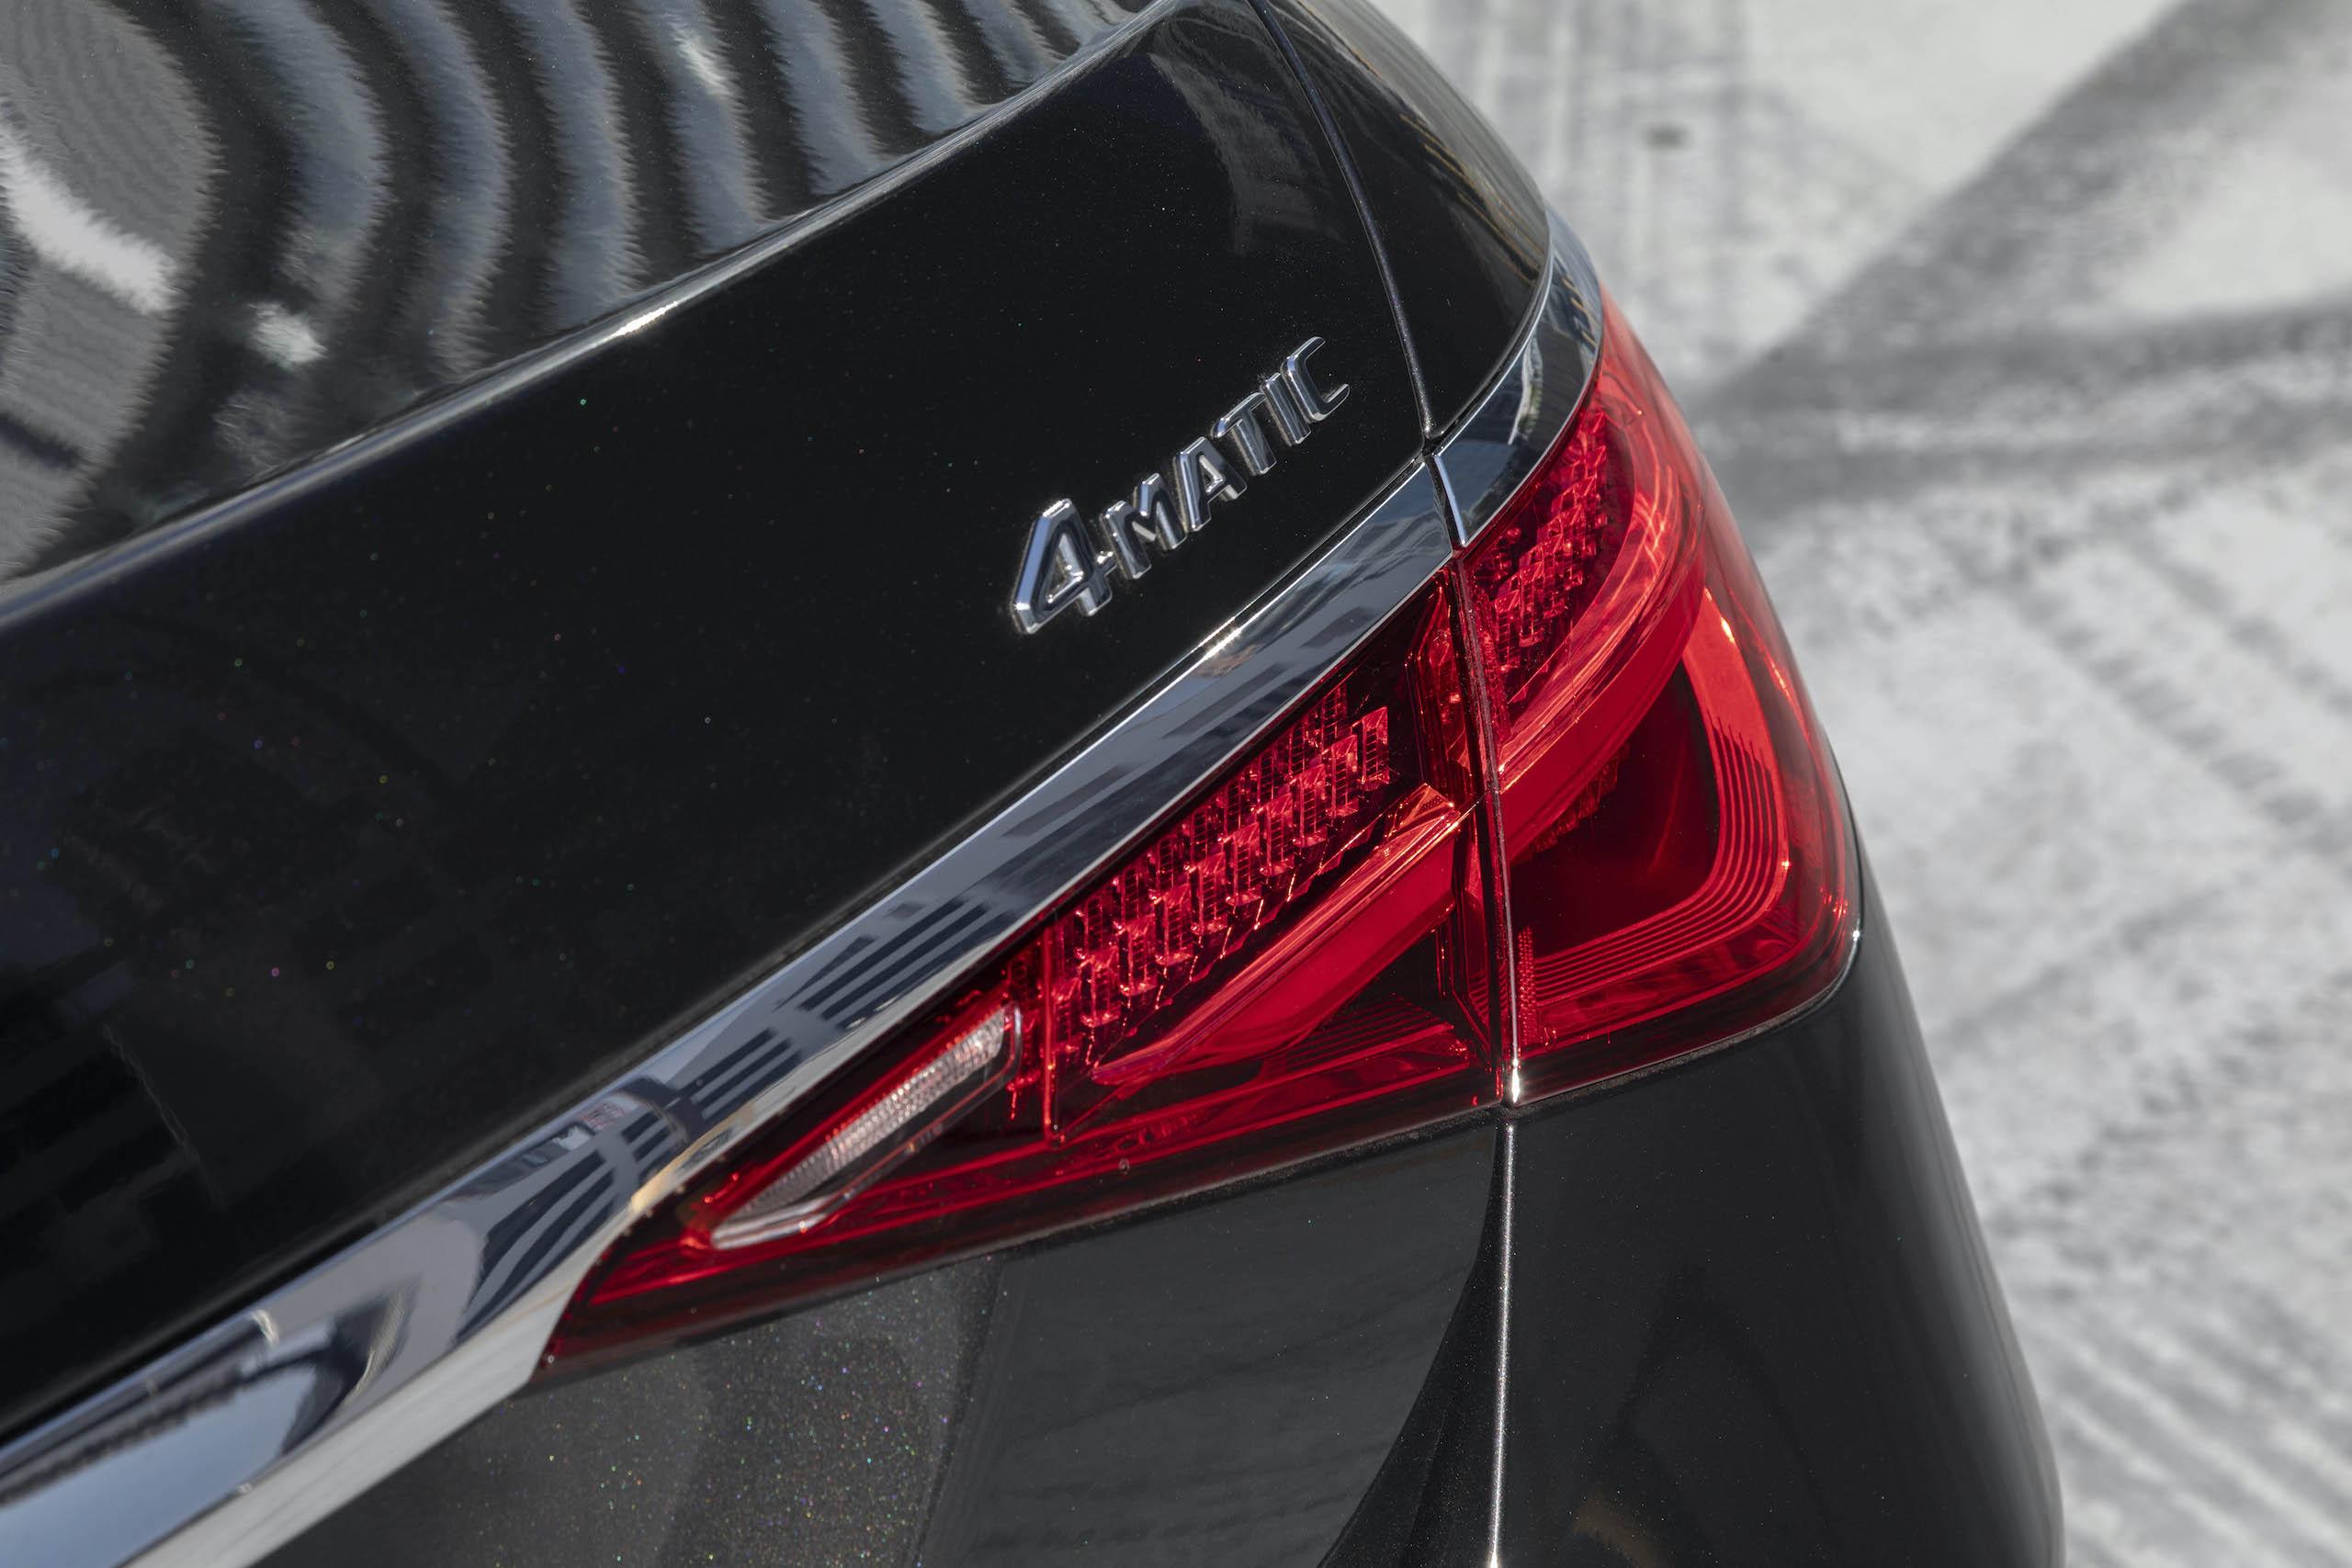 Mercedes Benz-S-Class rear 4matic badge